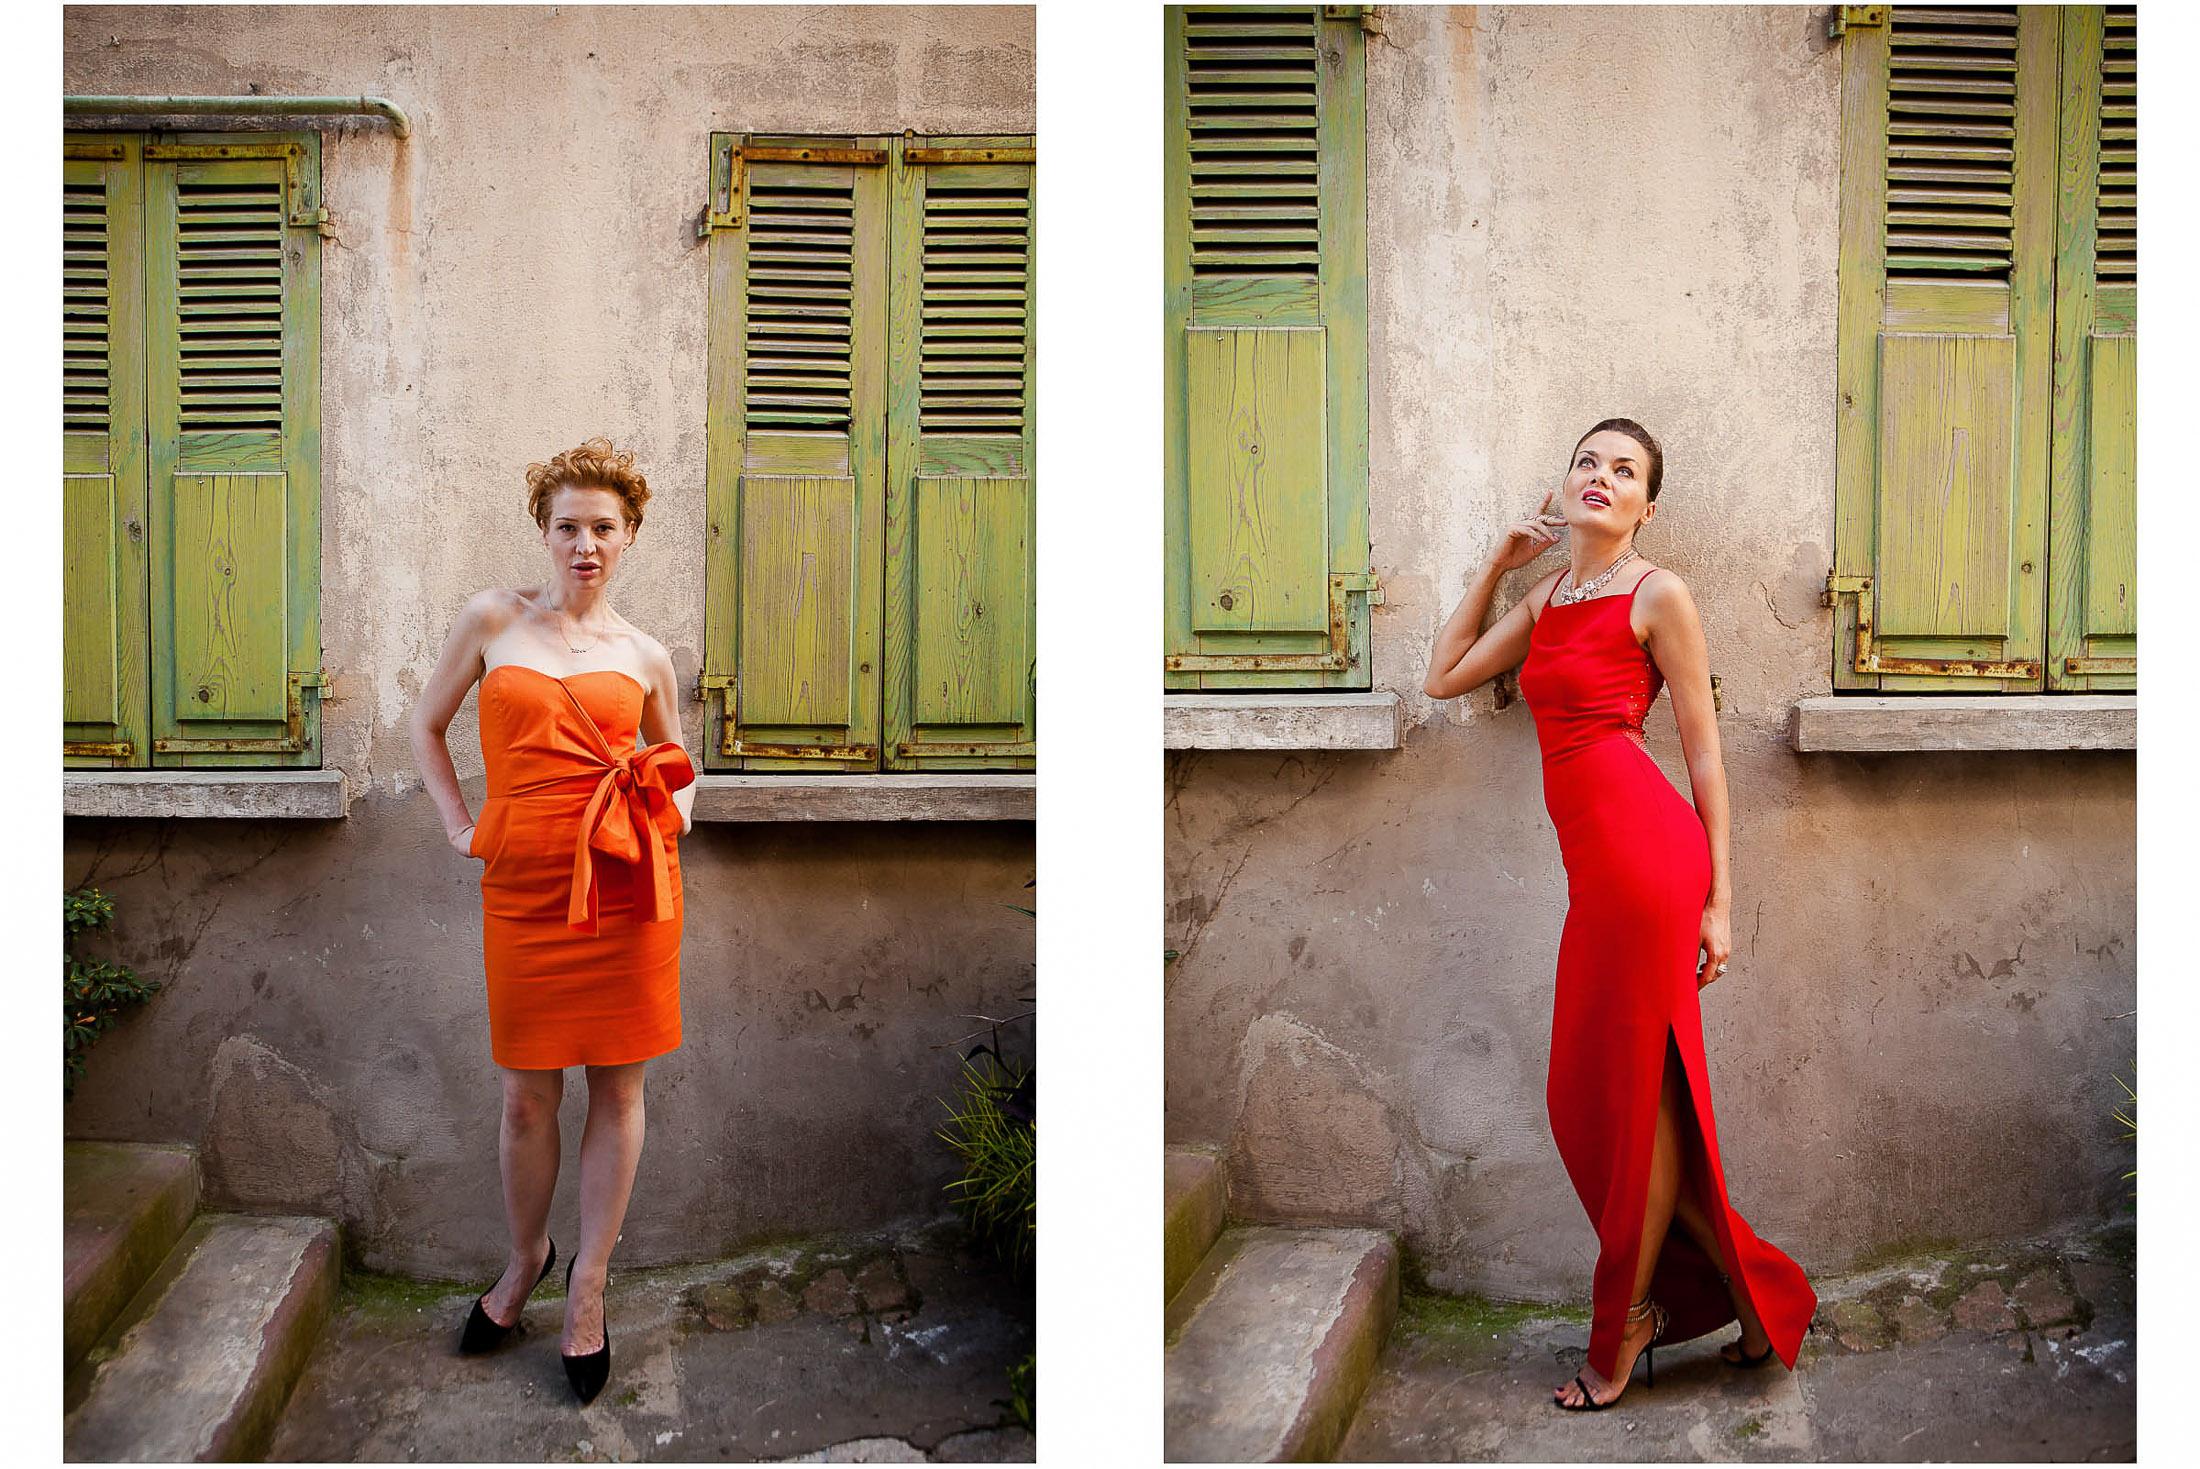 Rebecca-events-photographer-cannes-monaco14.jpg